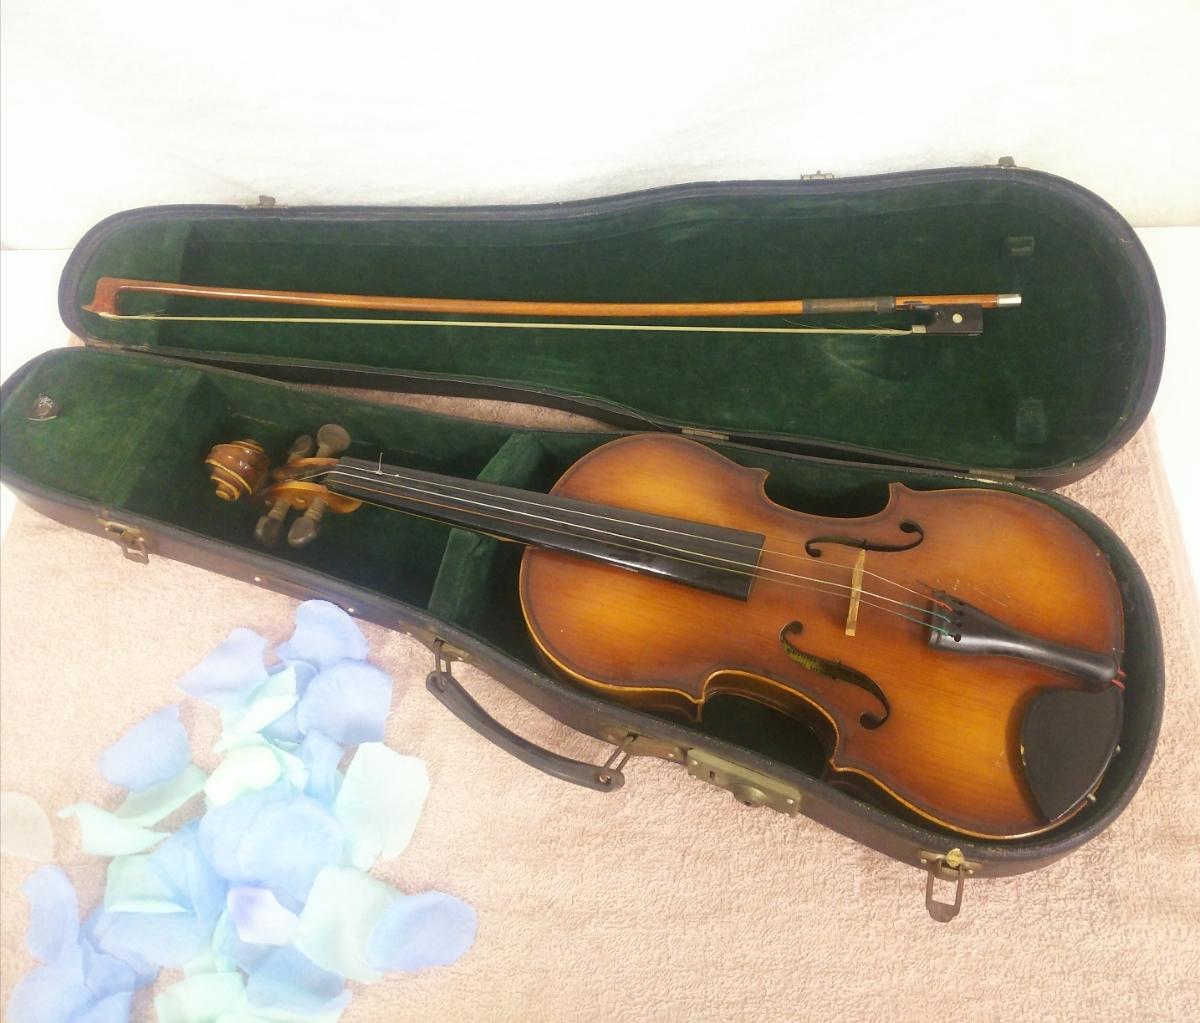 ○oSUZUKI * VIOLIN * バイオリンo○